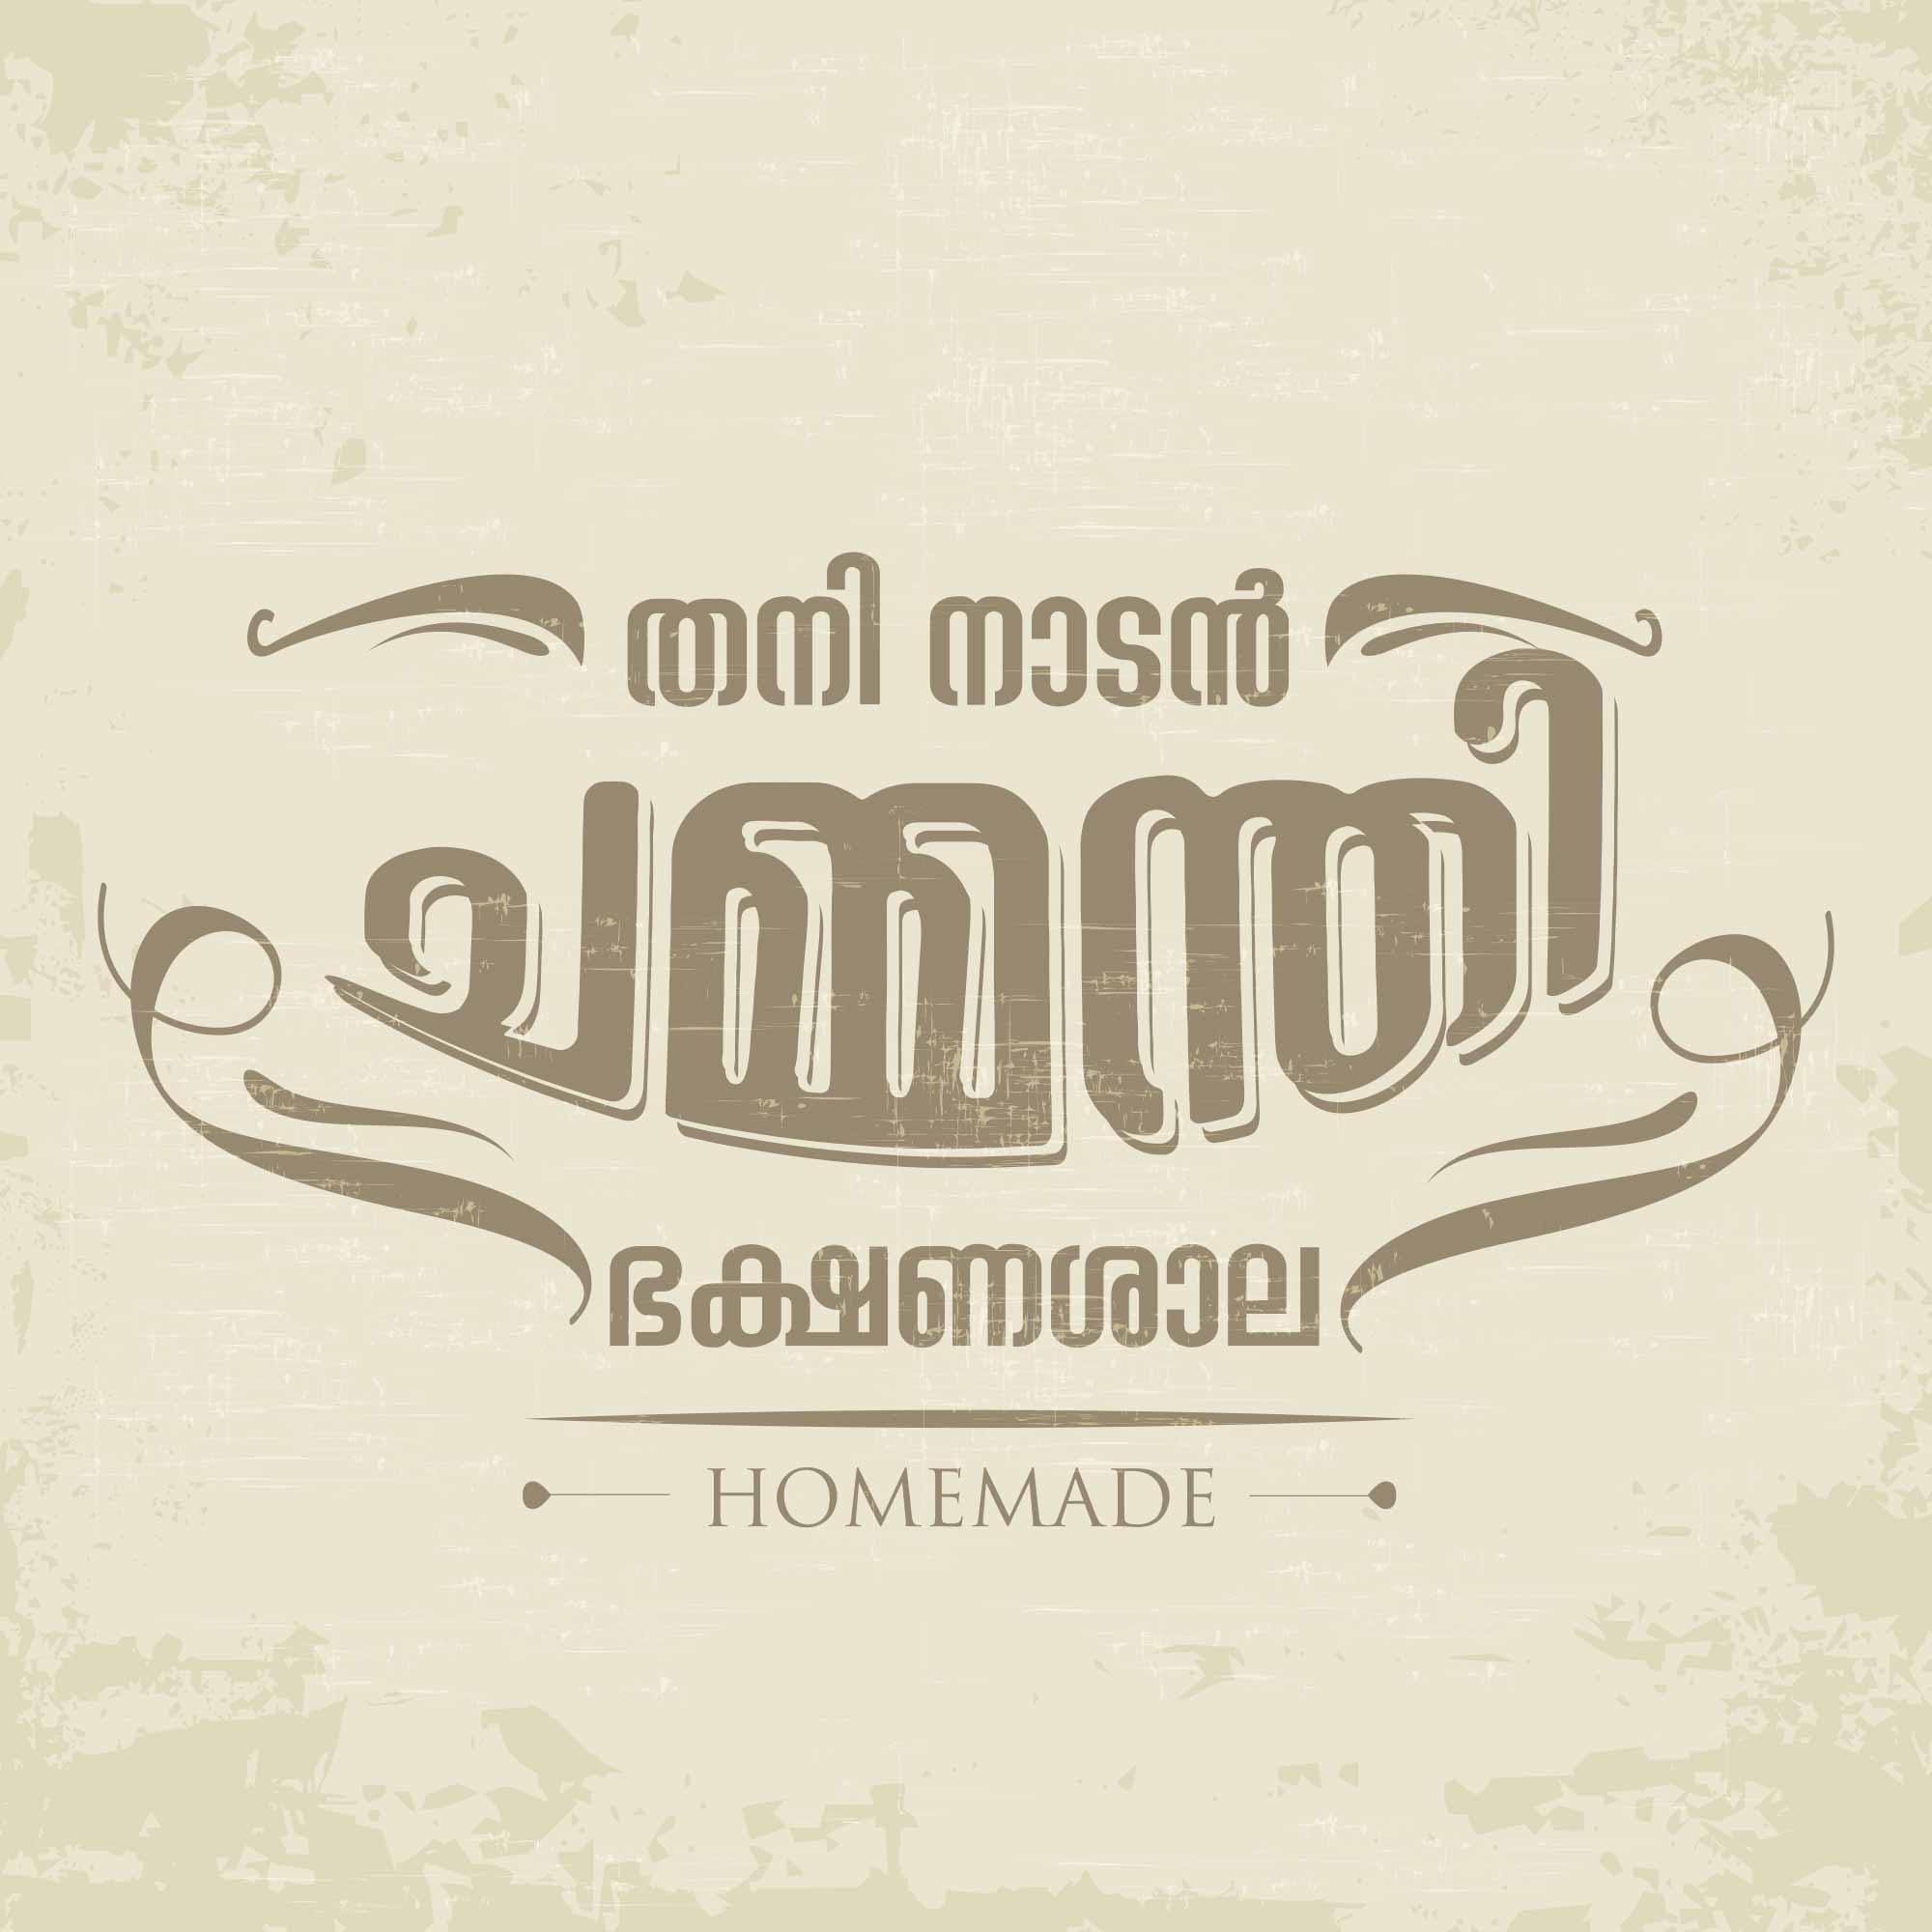 Restaurant logo expert in Kerala